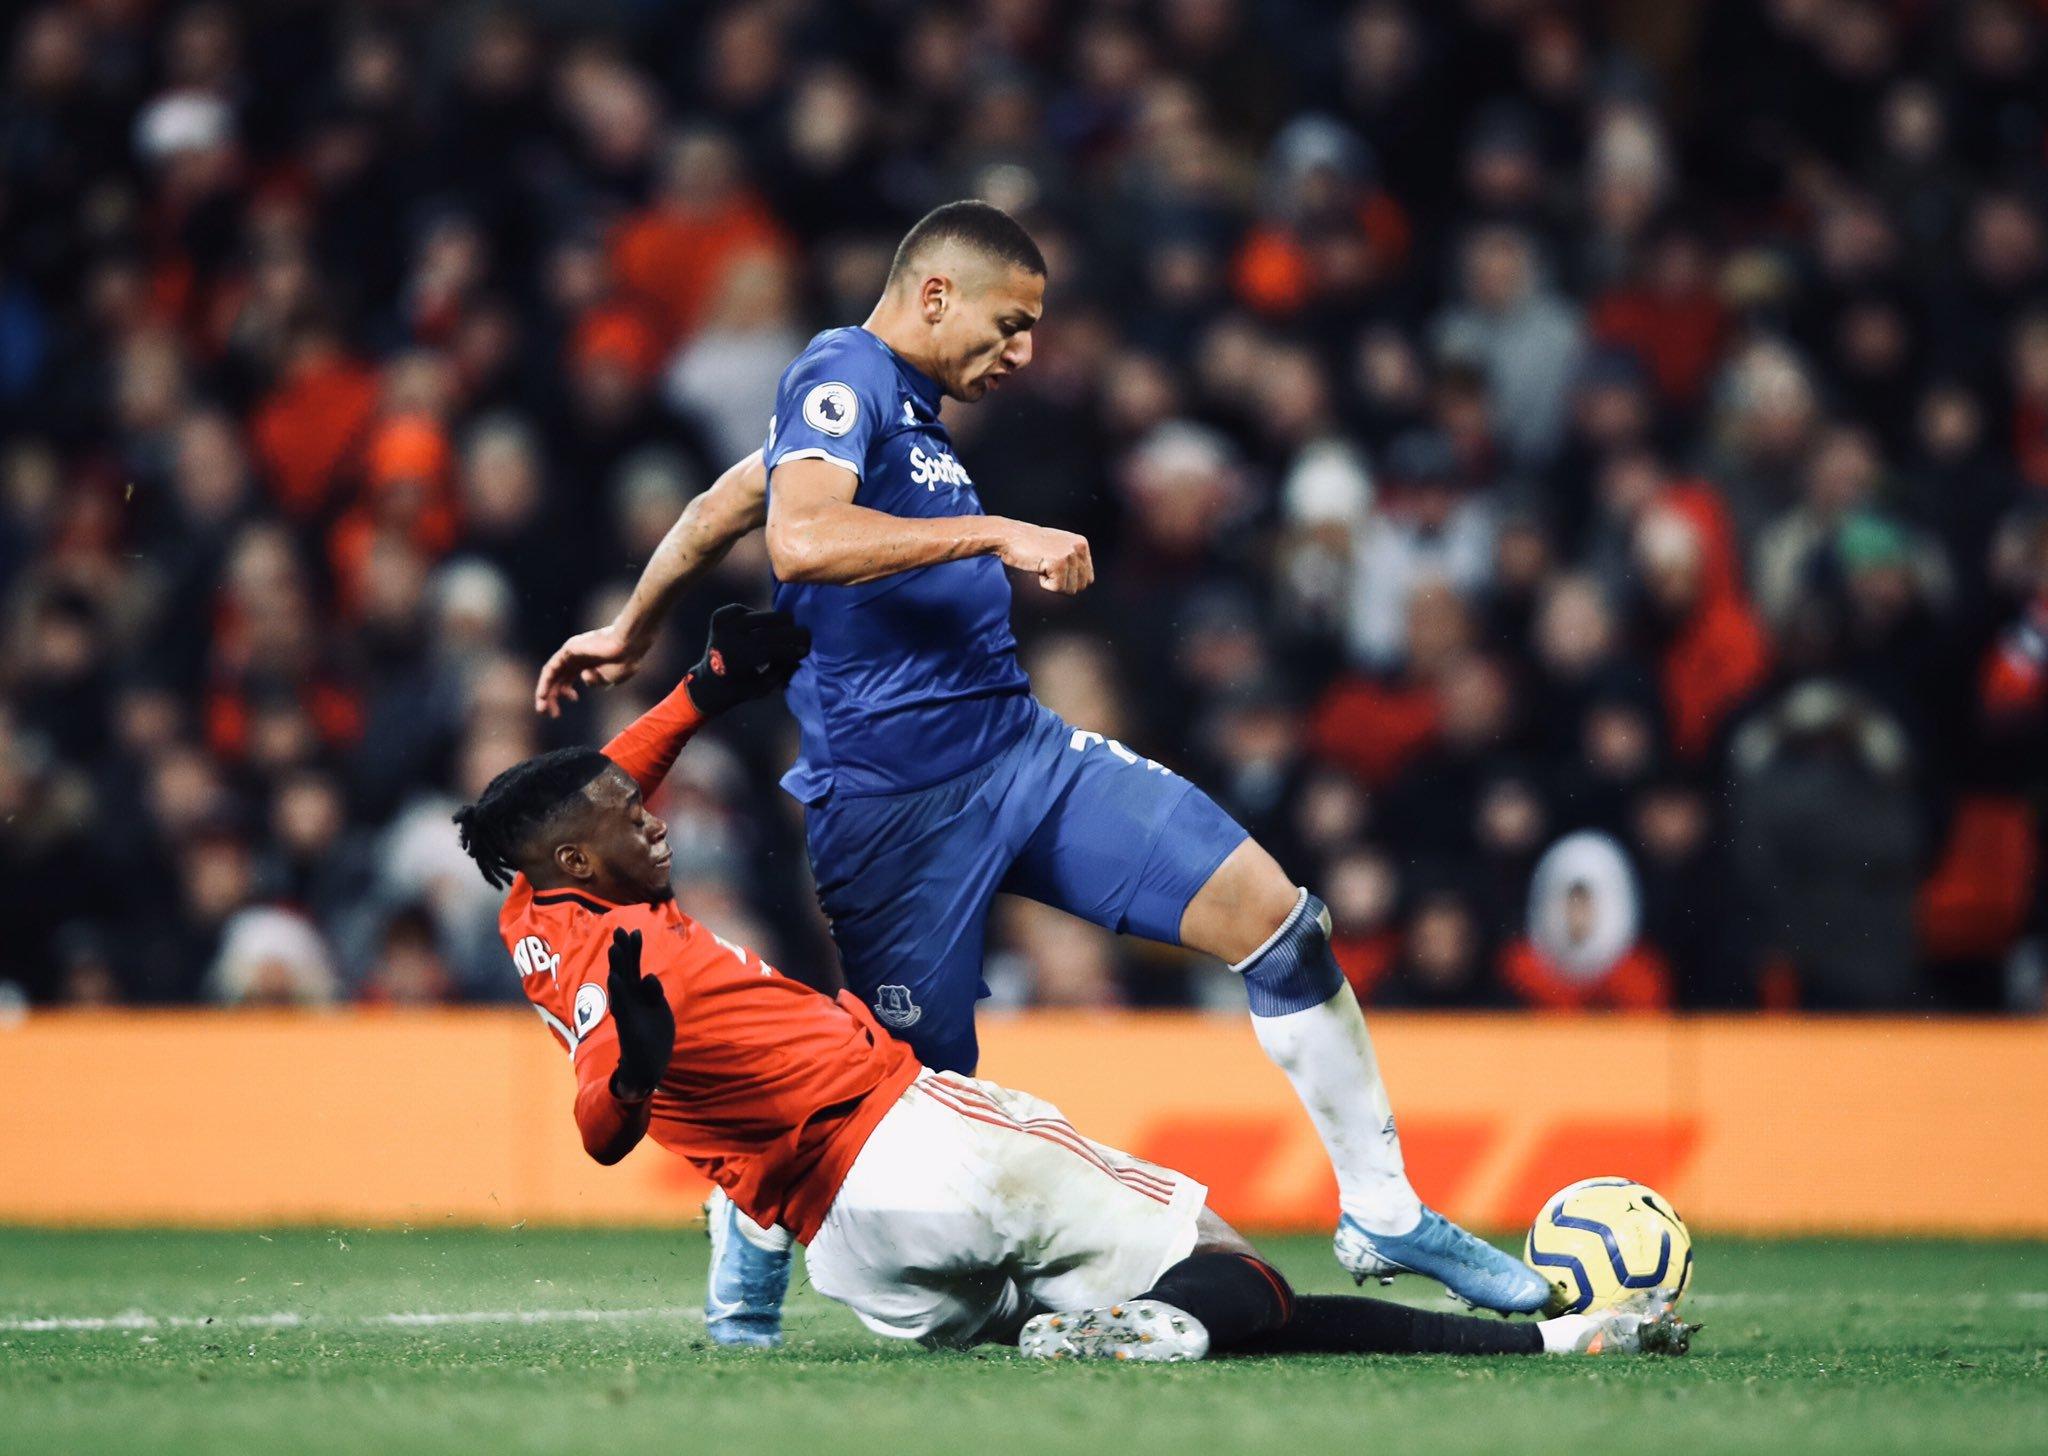 Wan Bissaka tackle